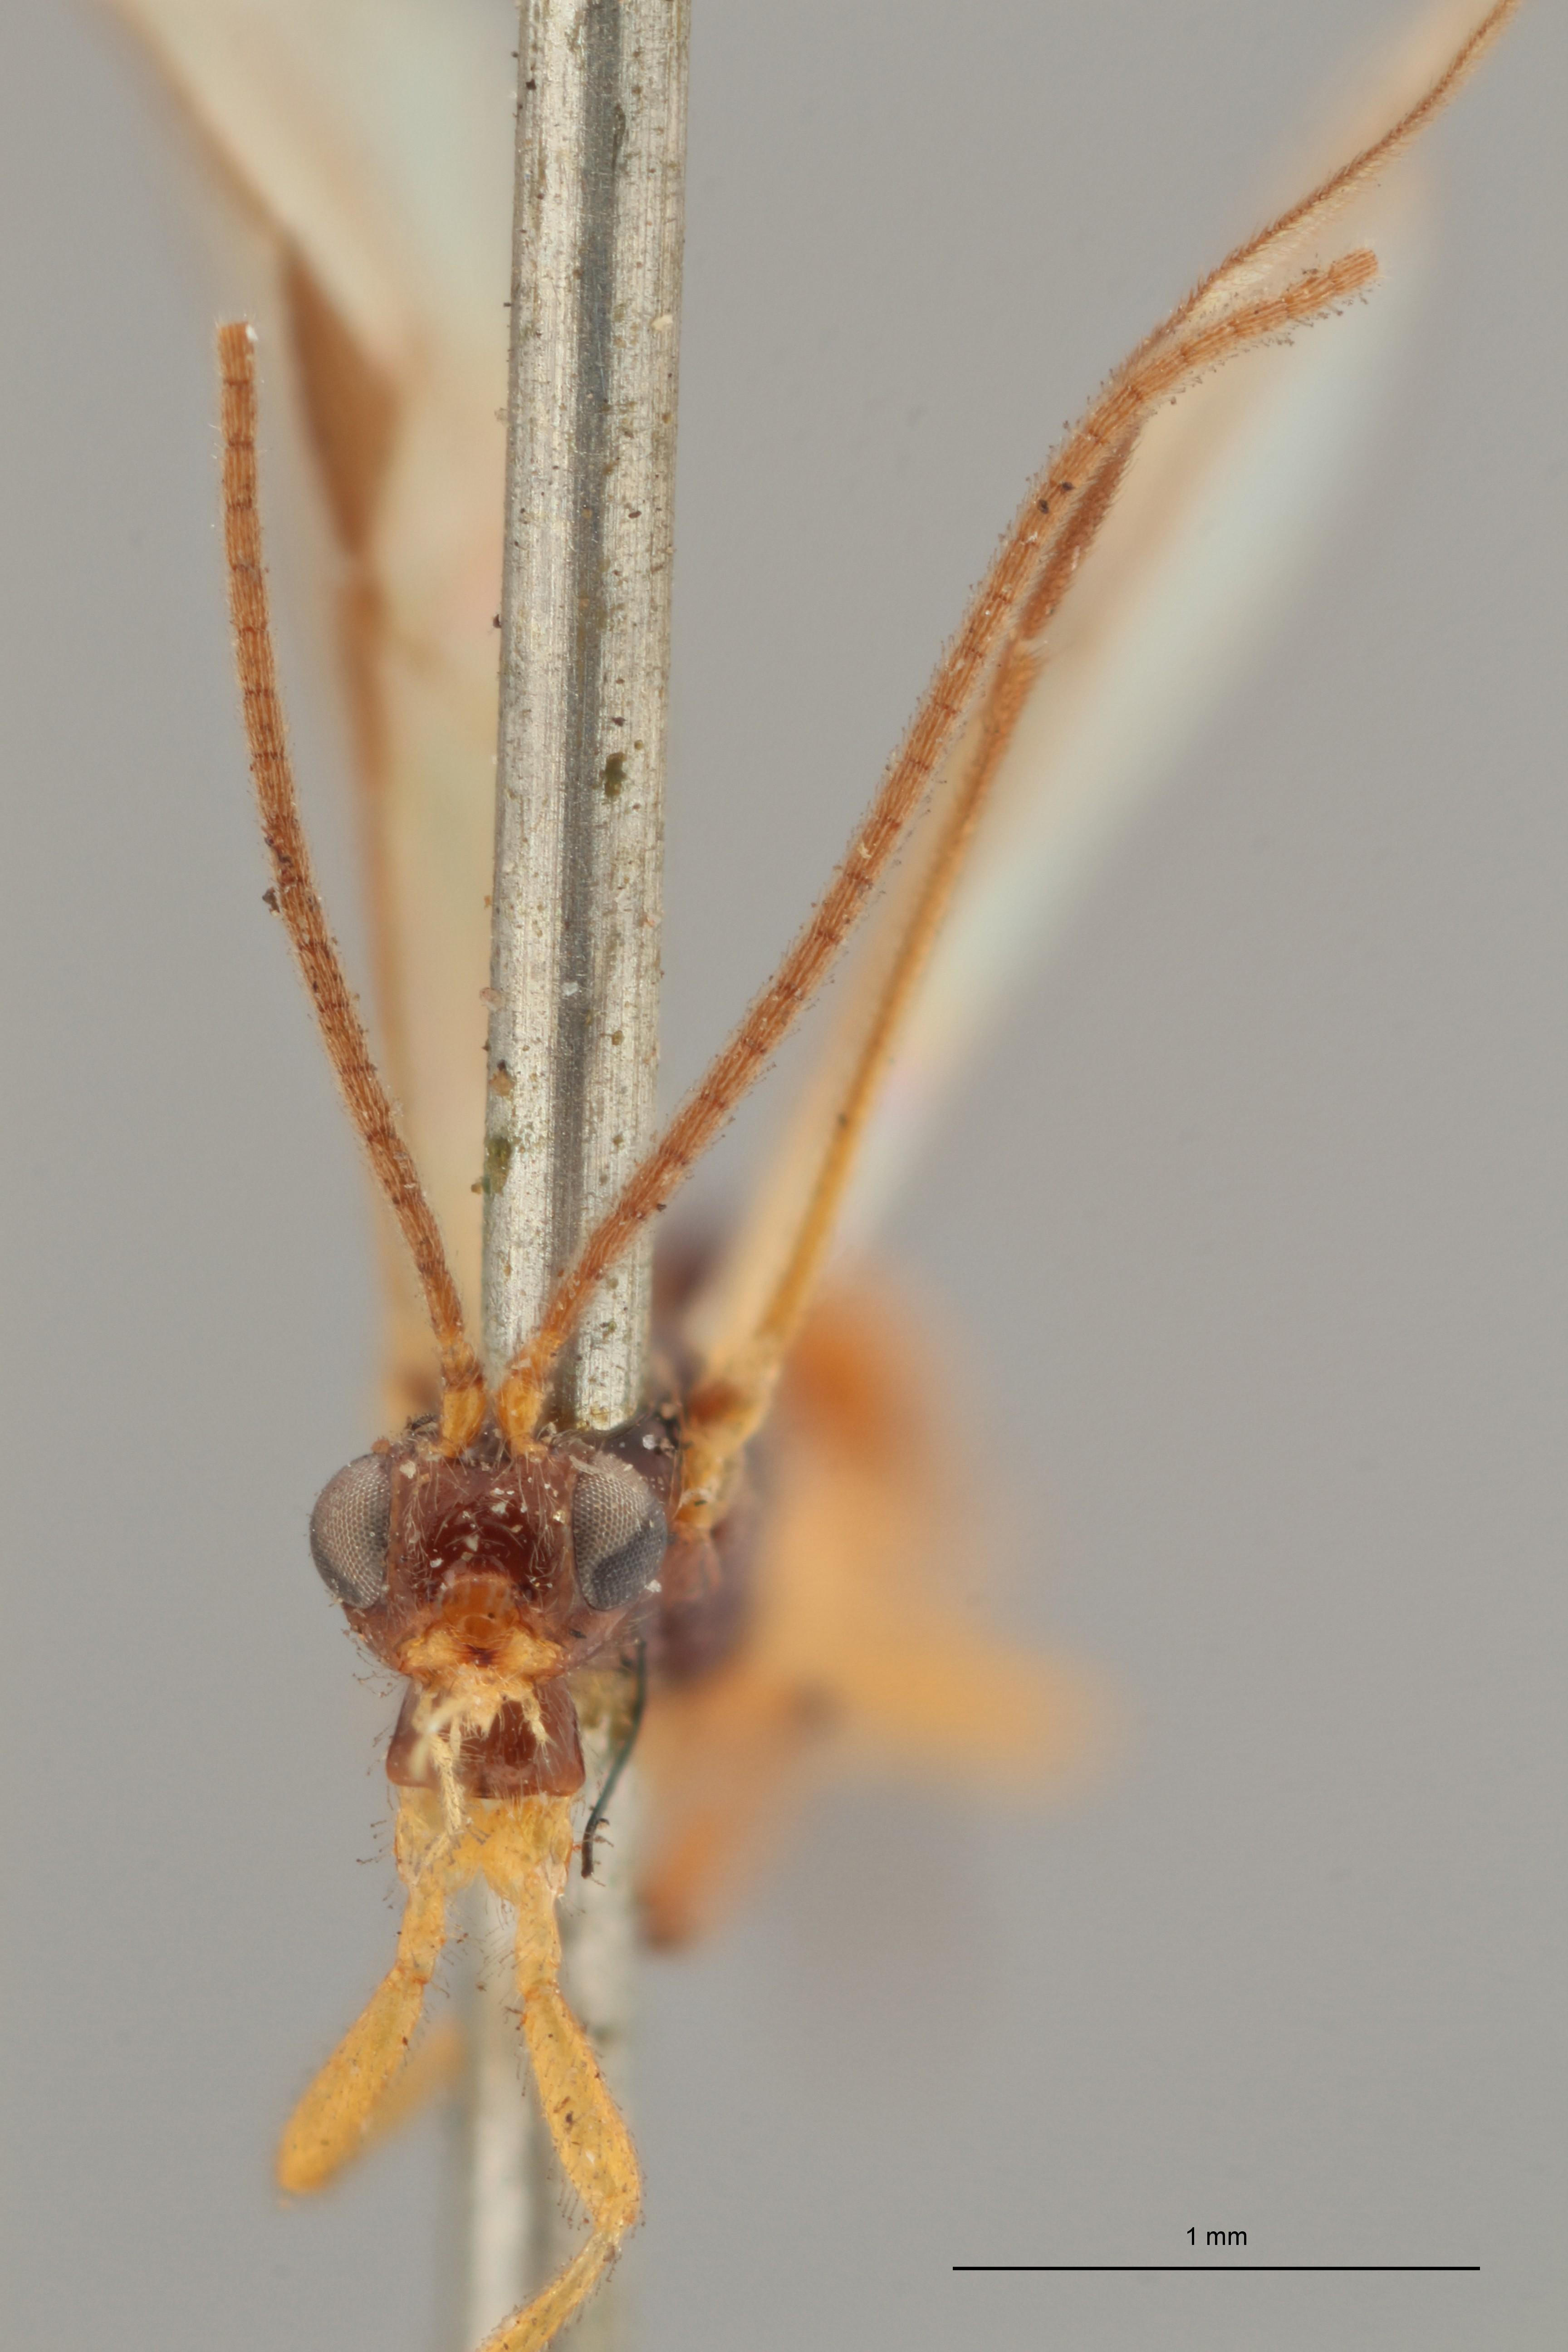 Braco picticornis lct F ZS PMax.jpg